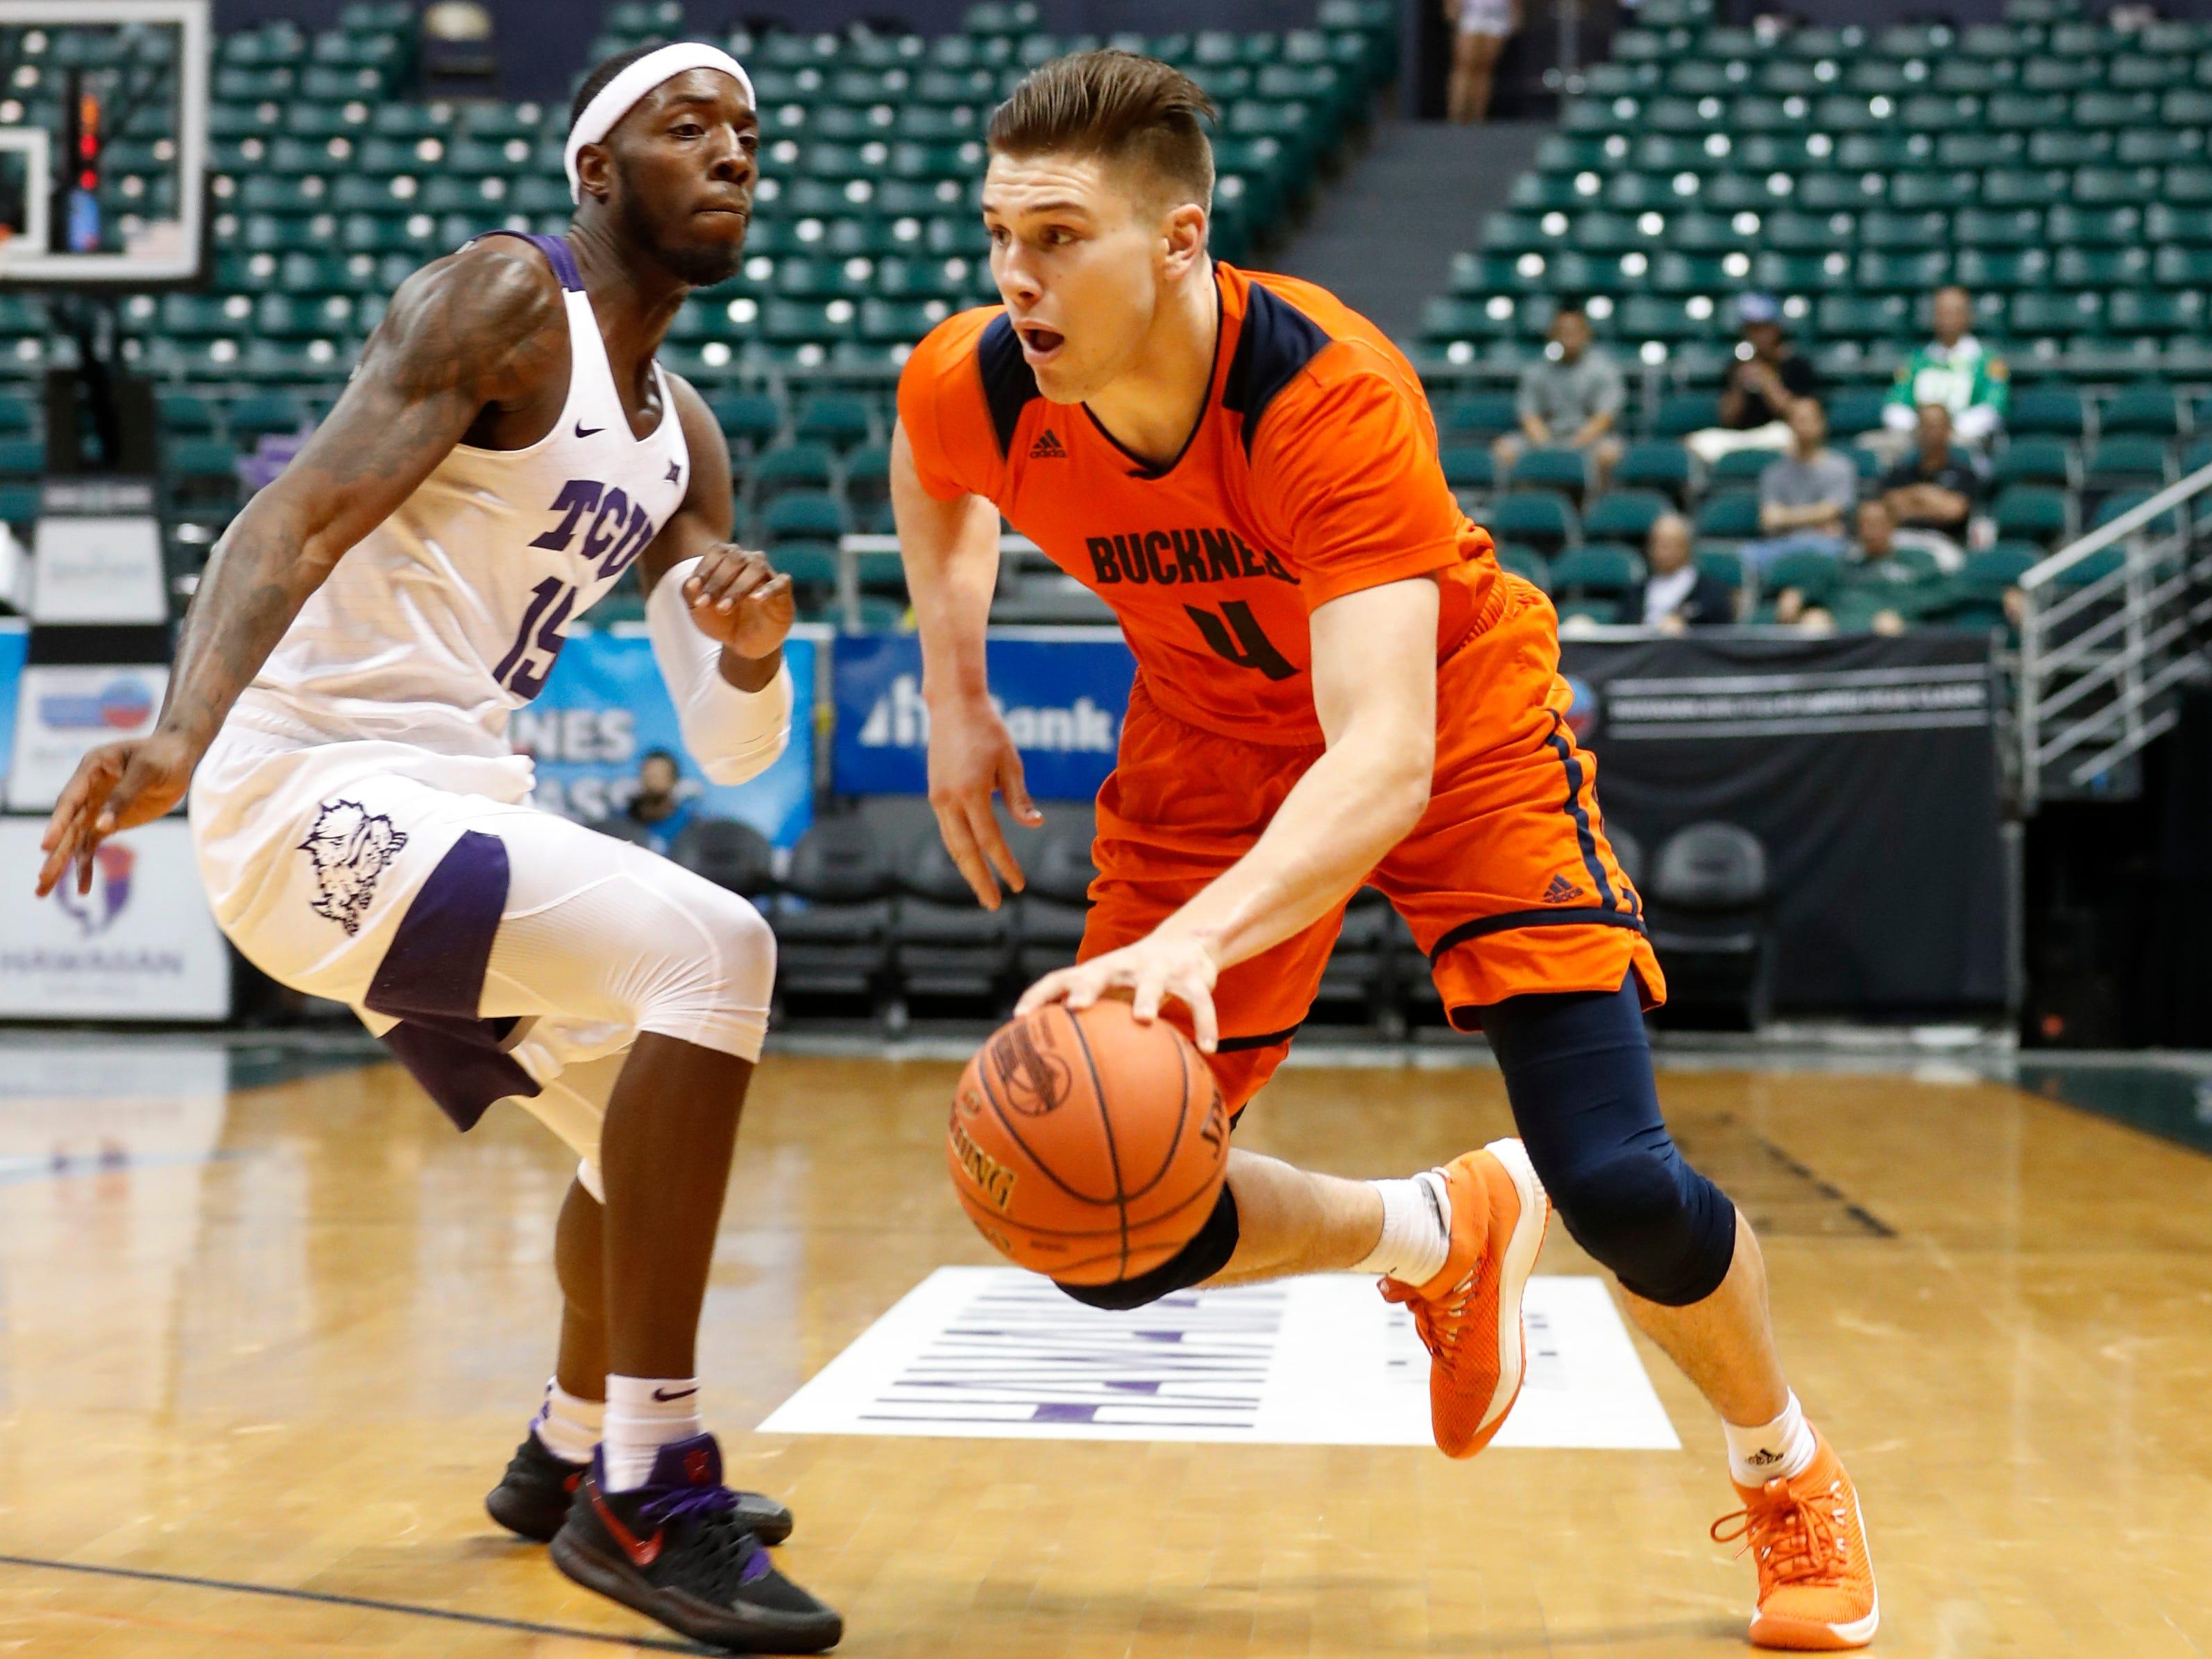 Kentucky basketball adds Bucknell graduate transfer Nate Sestina for next season